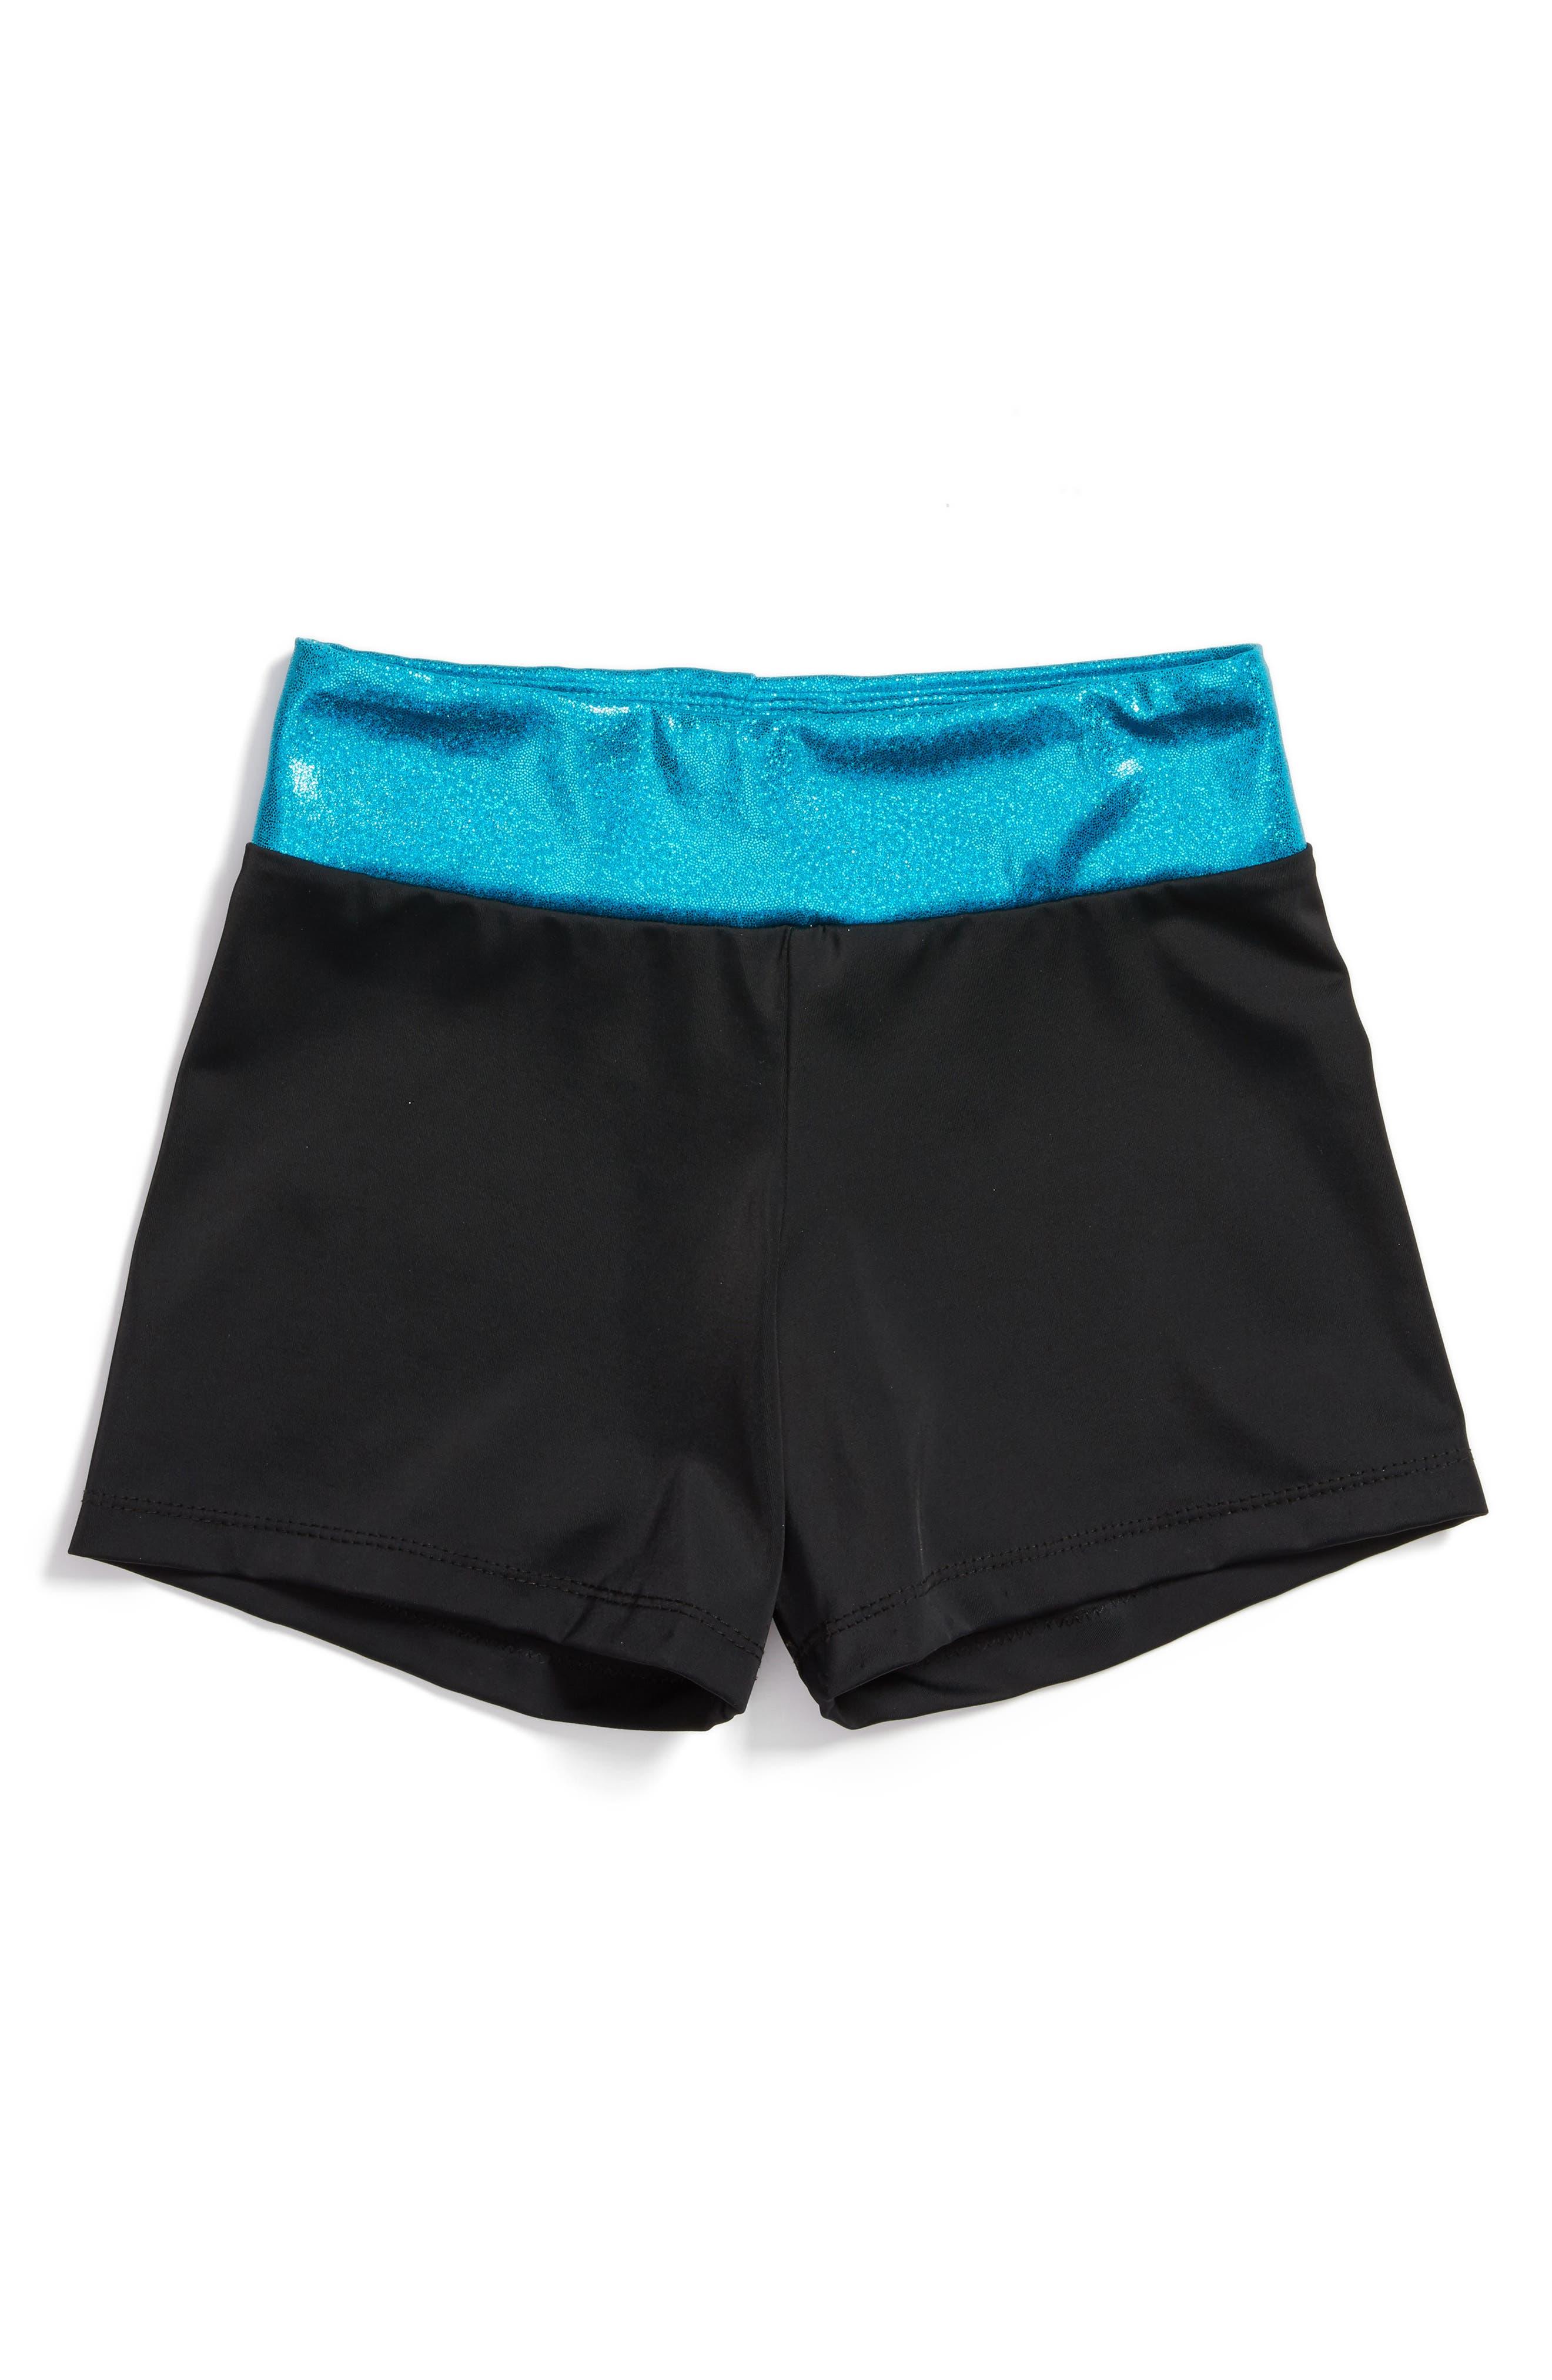 Unicorn Love Stretch Shorts,                         Main,                         color, 001